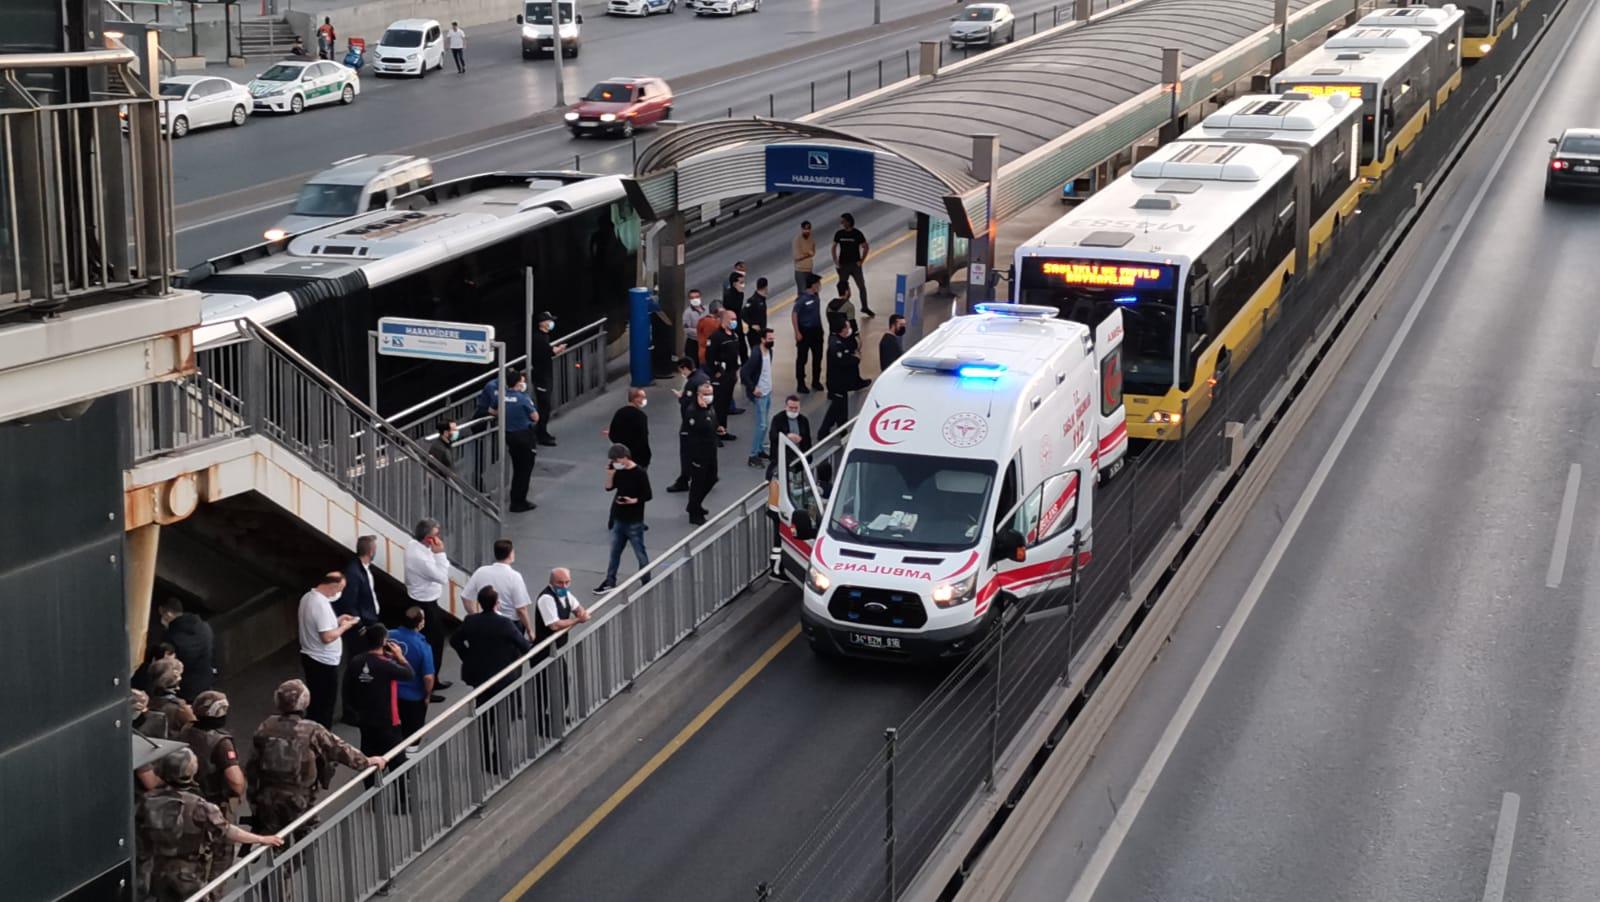 Haramidere Metrobüs Durağında Rehine Krizi!